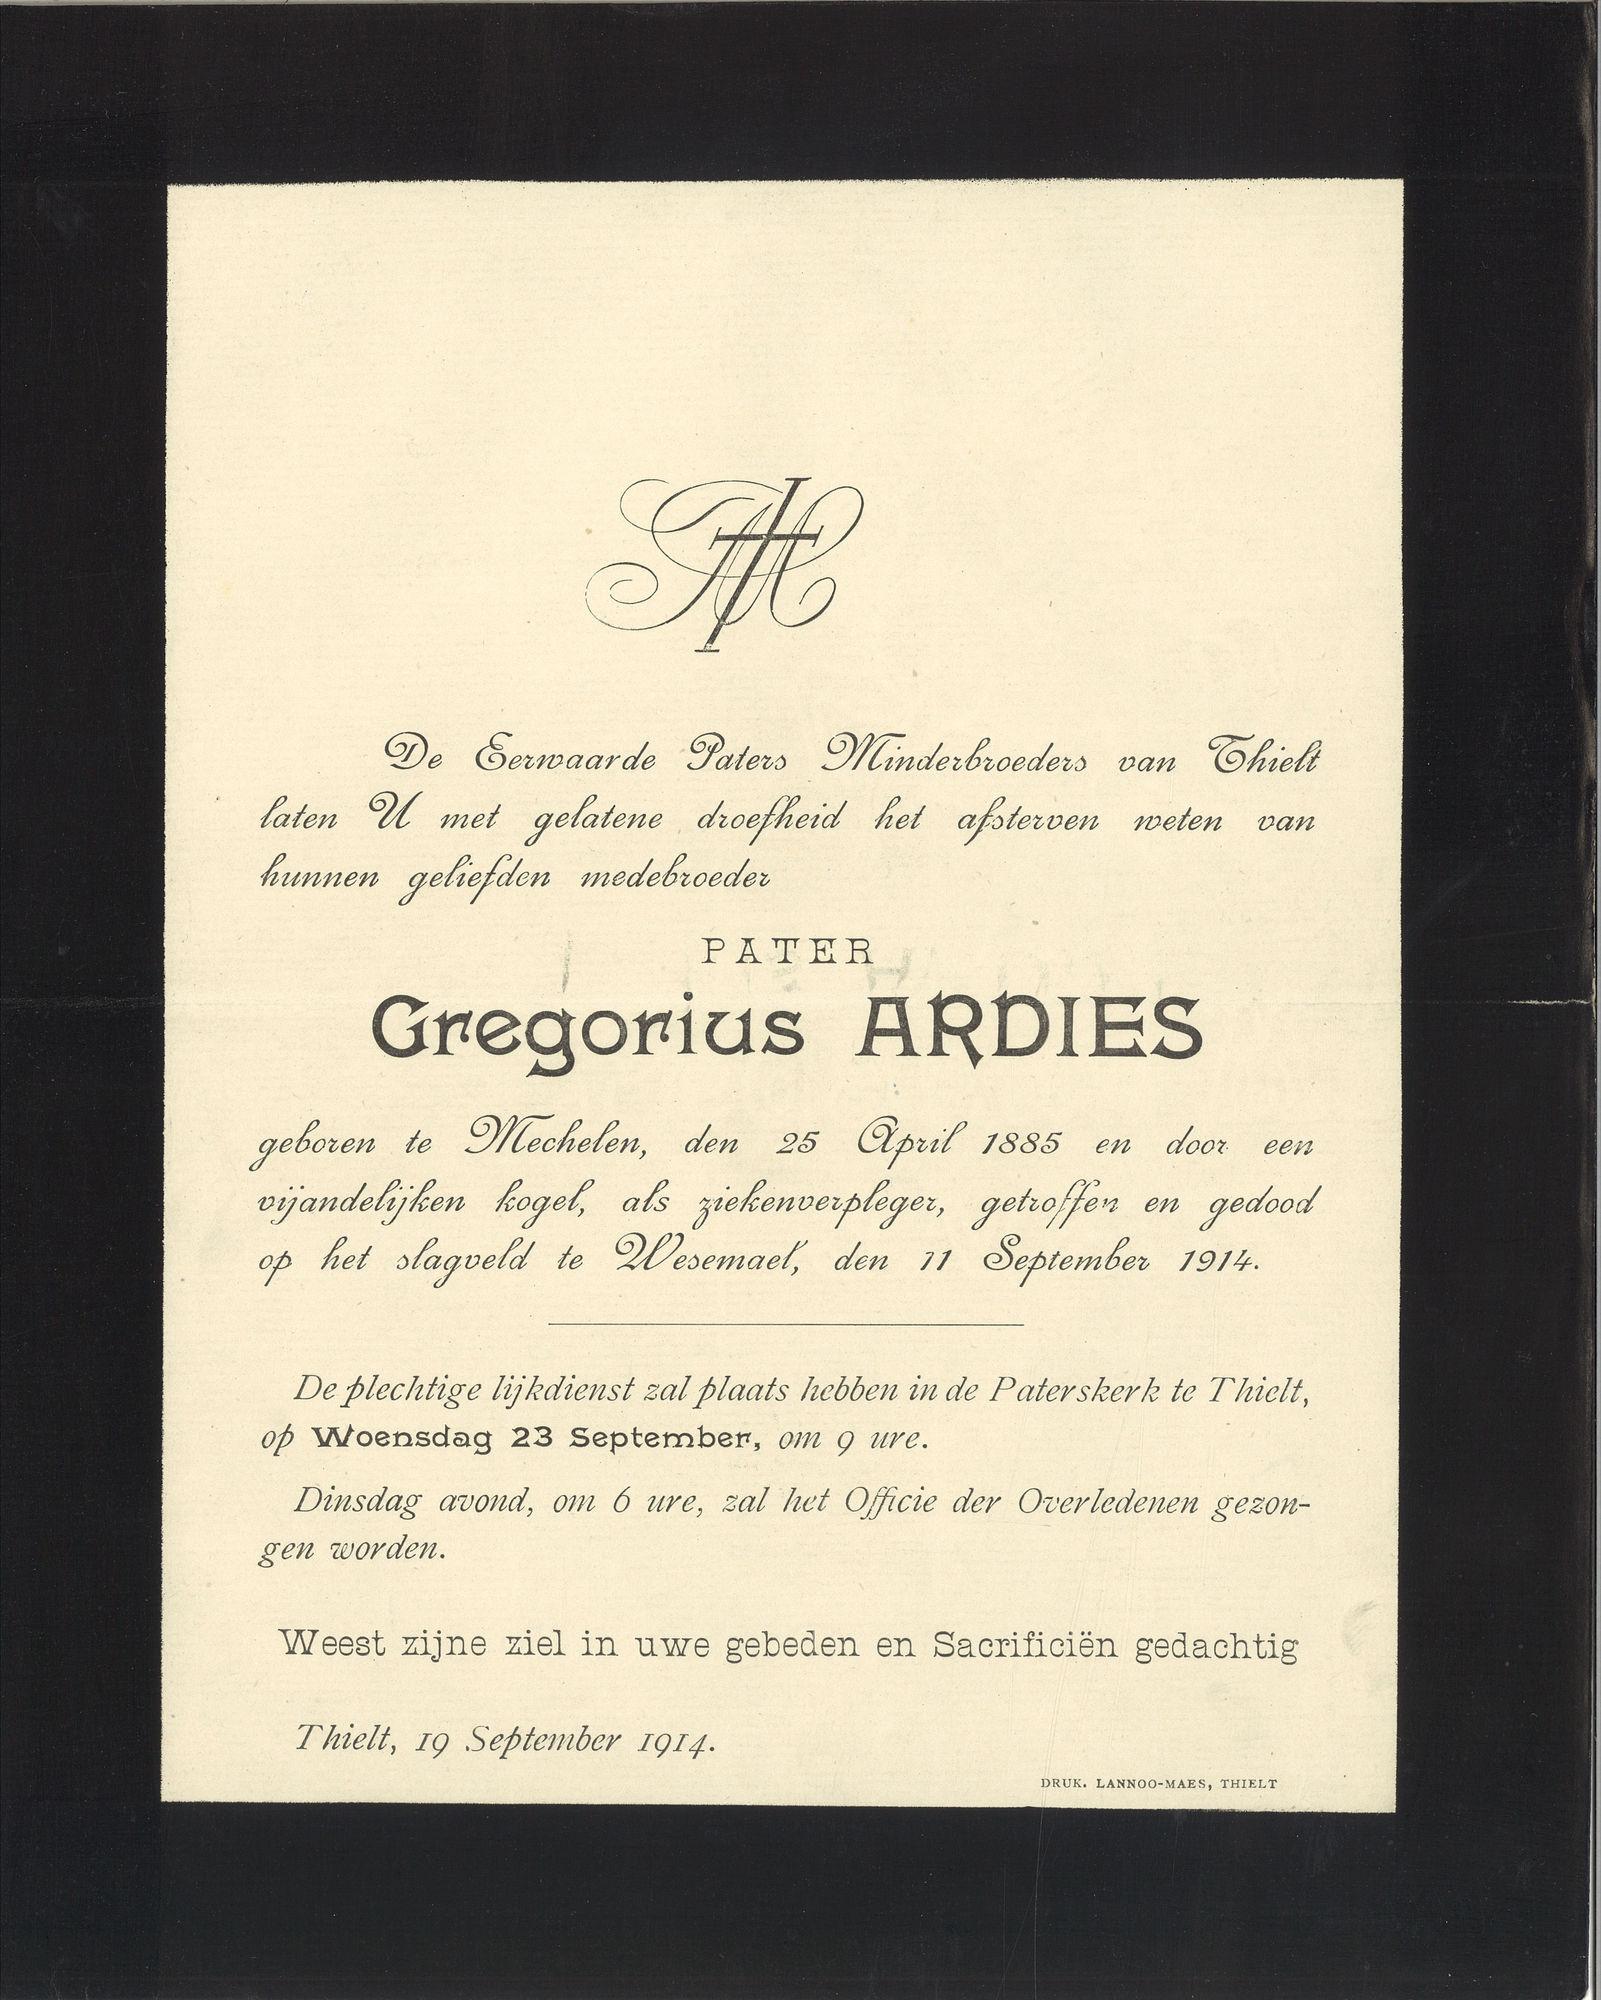 Gregorius Ardies